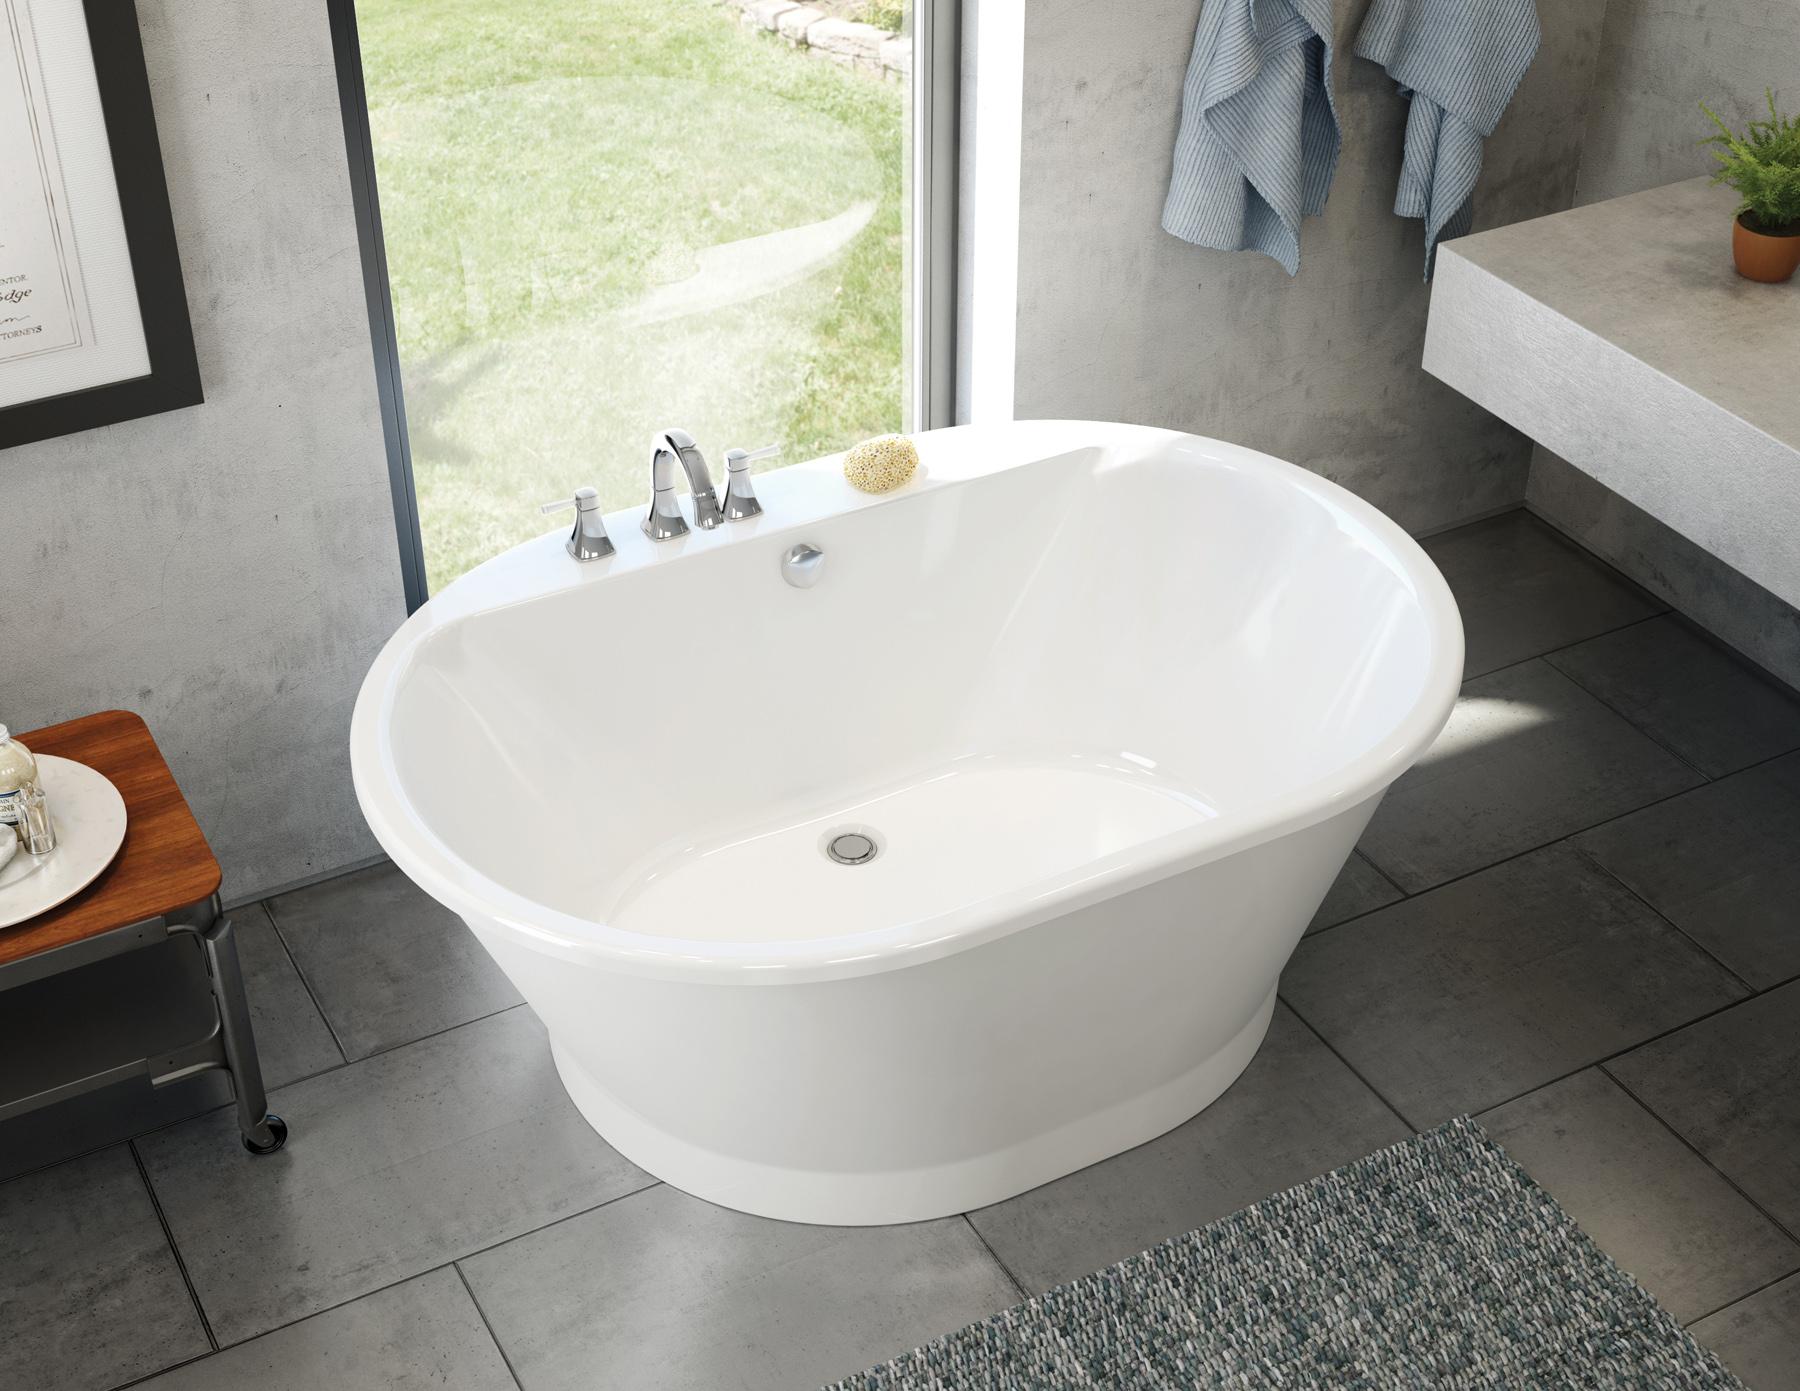 Maax Professional Introduces Affordable Brioso Tub JLC